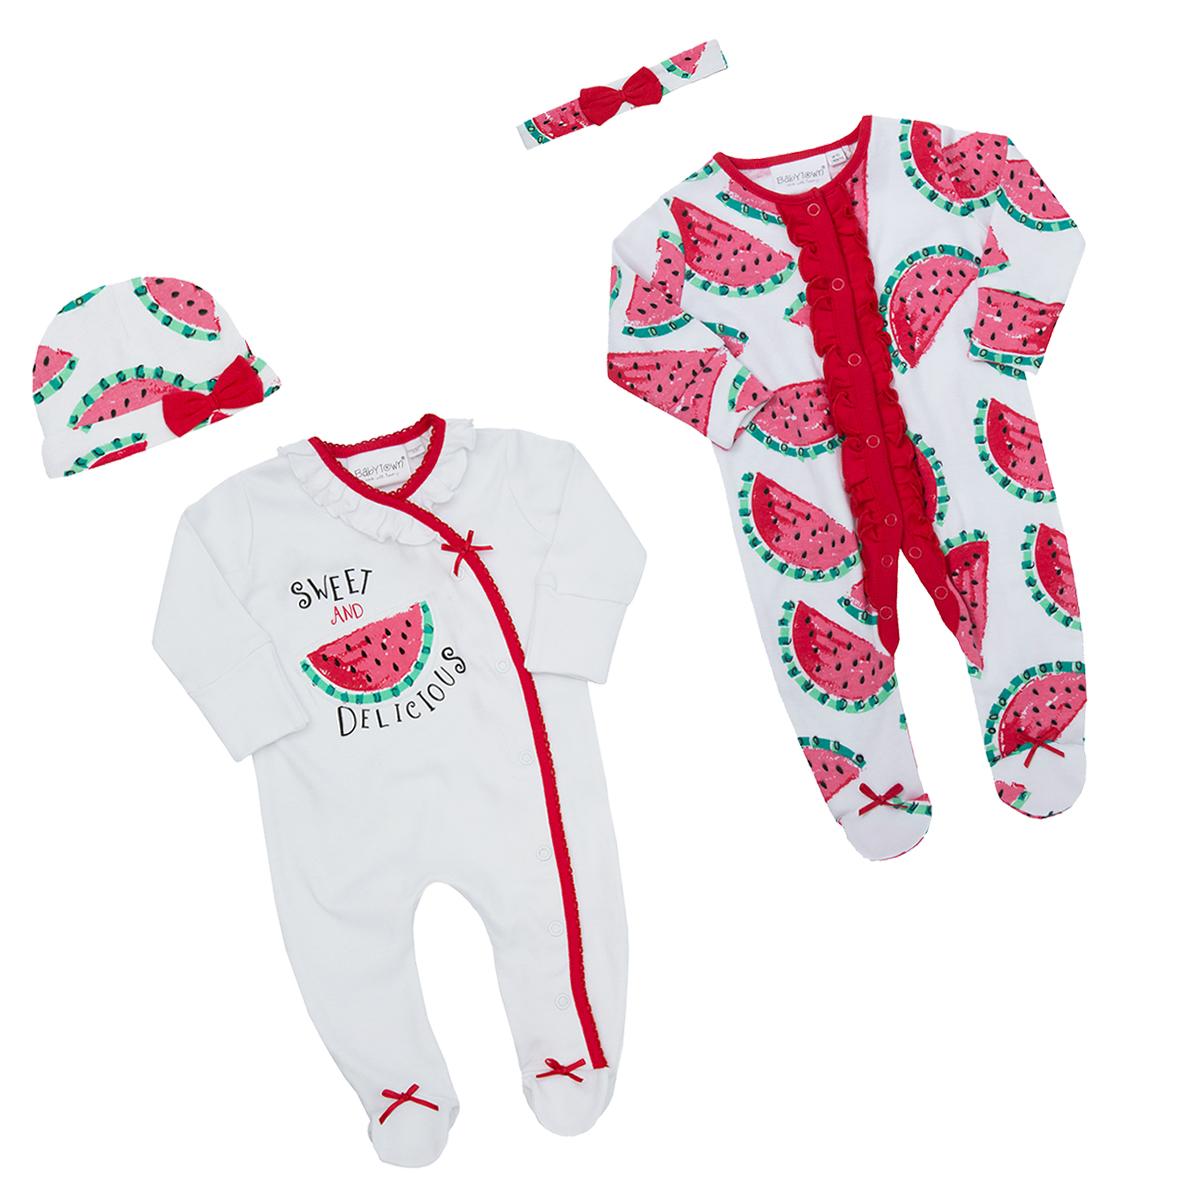 b3c659b96 Premature Newborn Baby Girls Sleepsuit Novelty Watermelon Babygrow Bodysuit  New